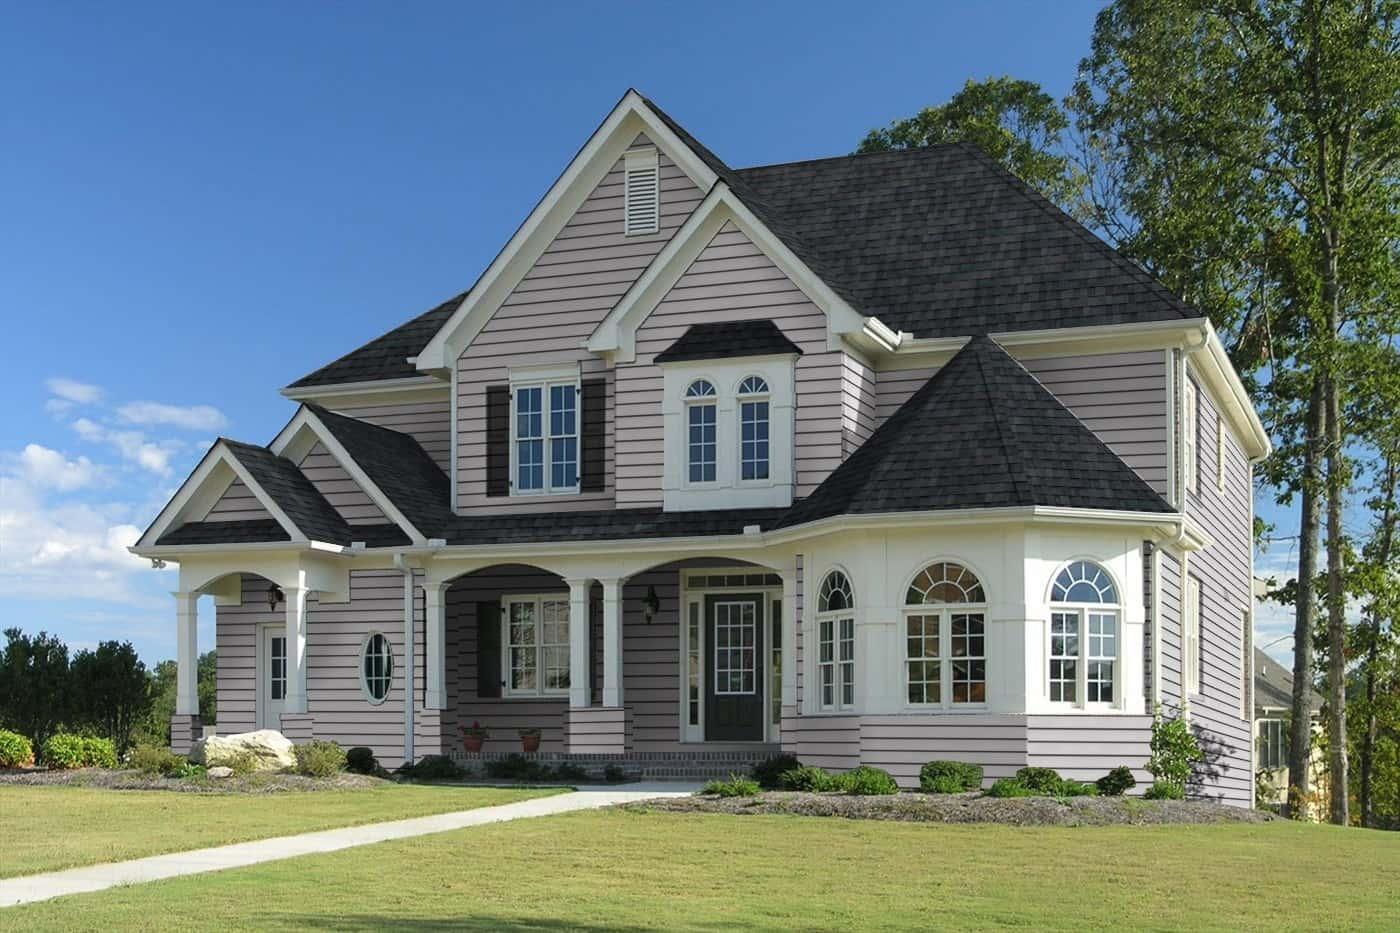 TAMKO Heritage Premium Rustic Black House